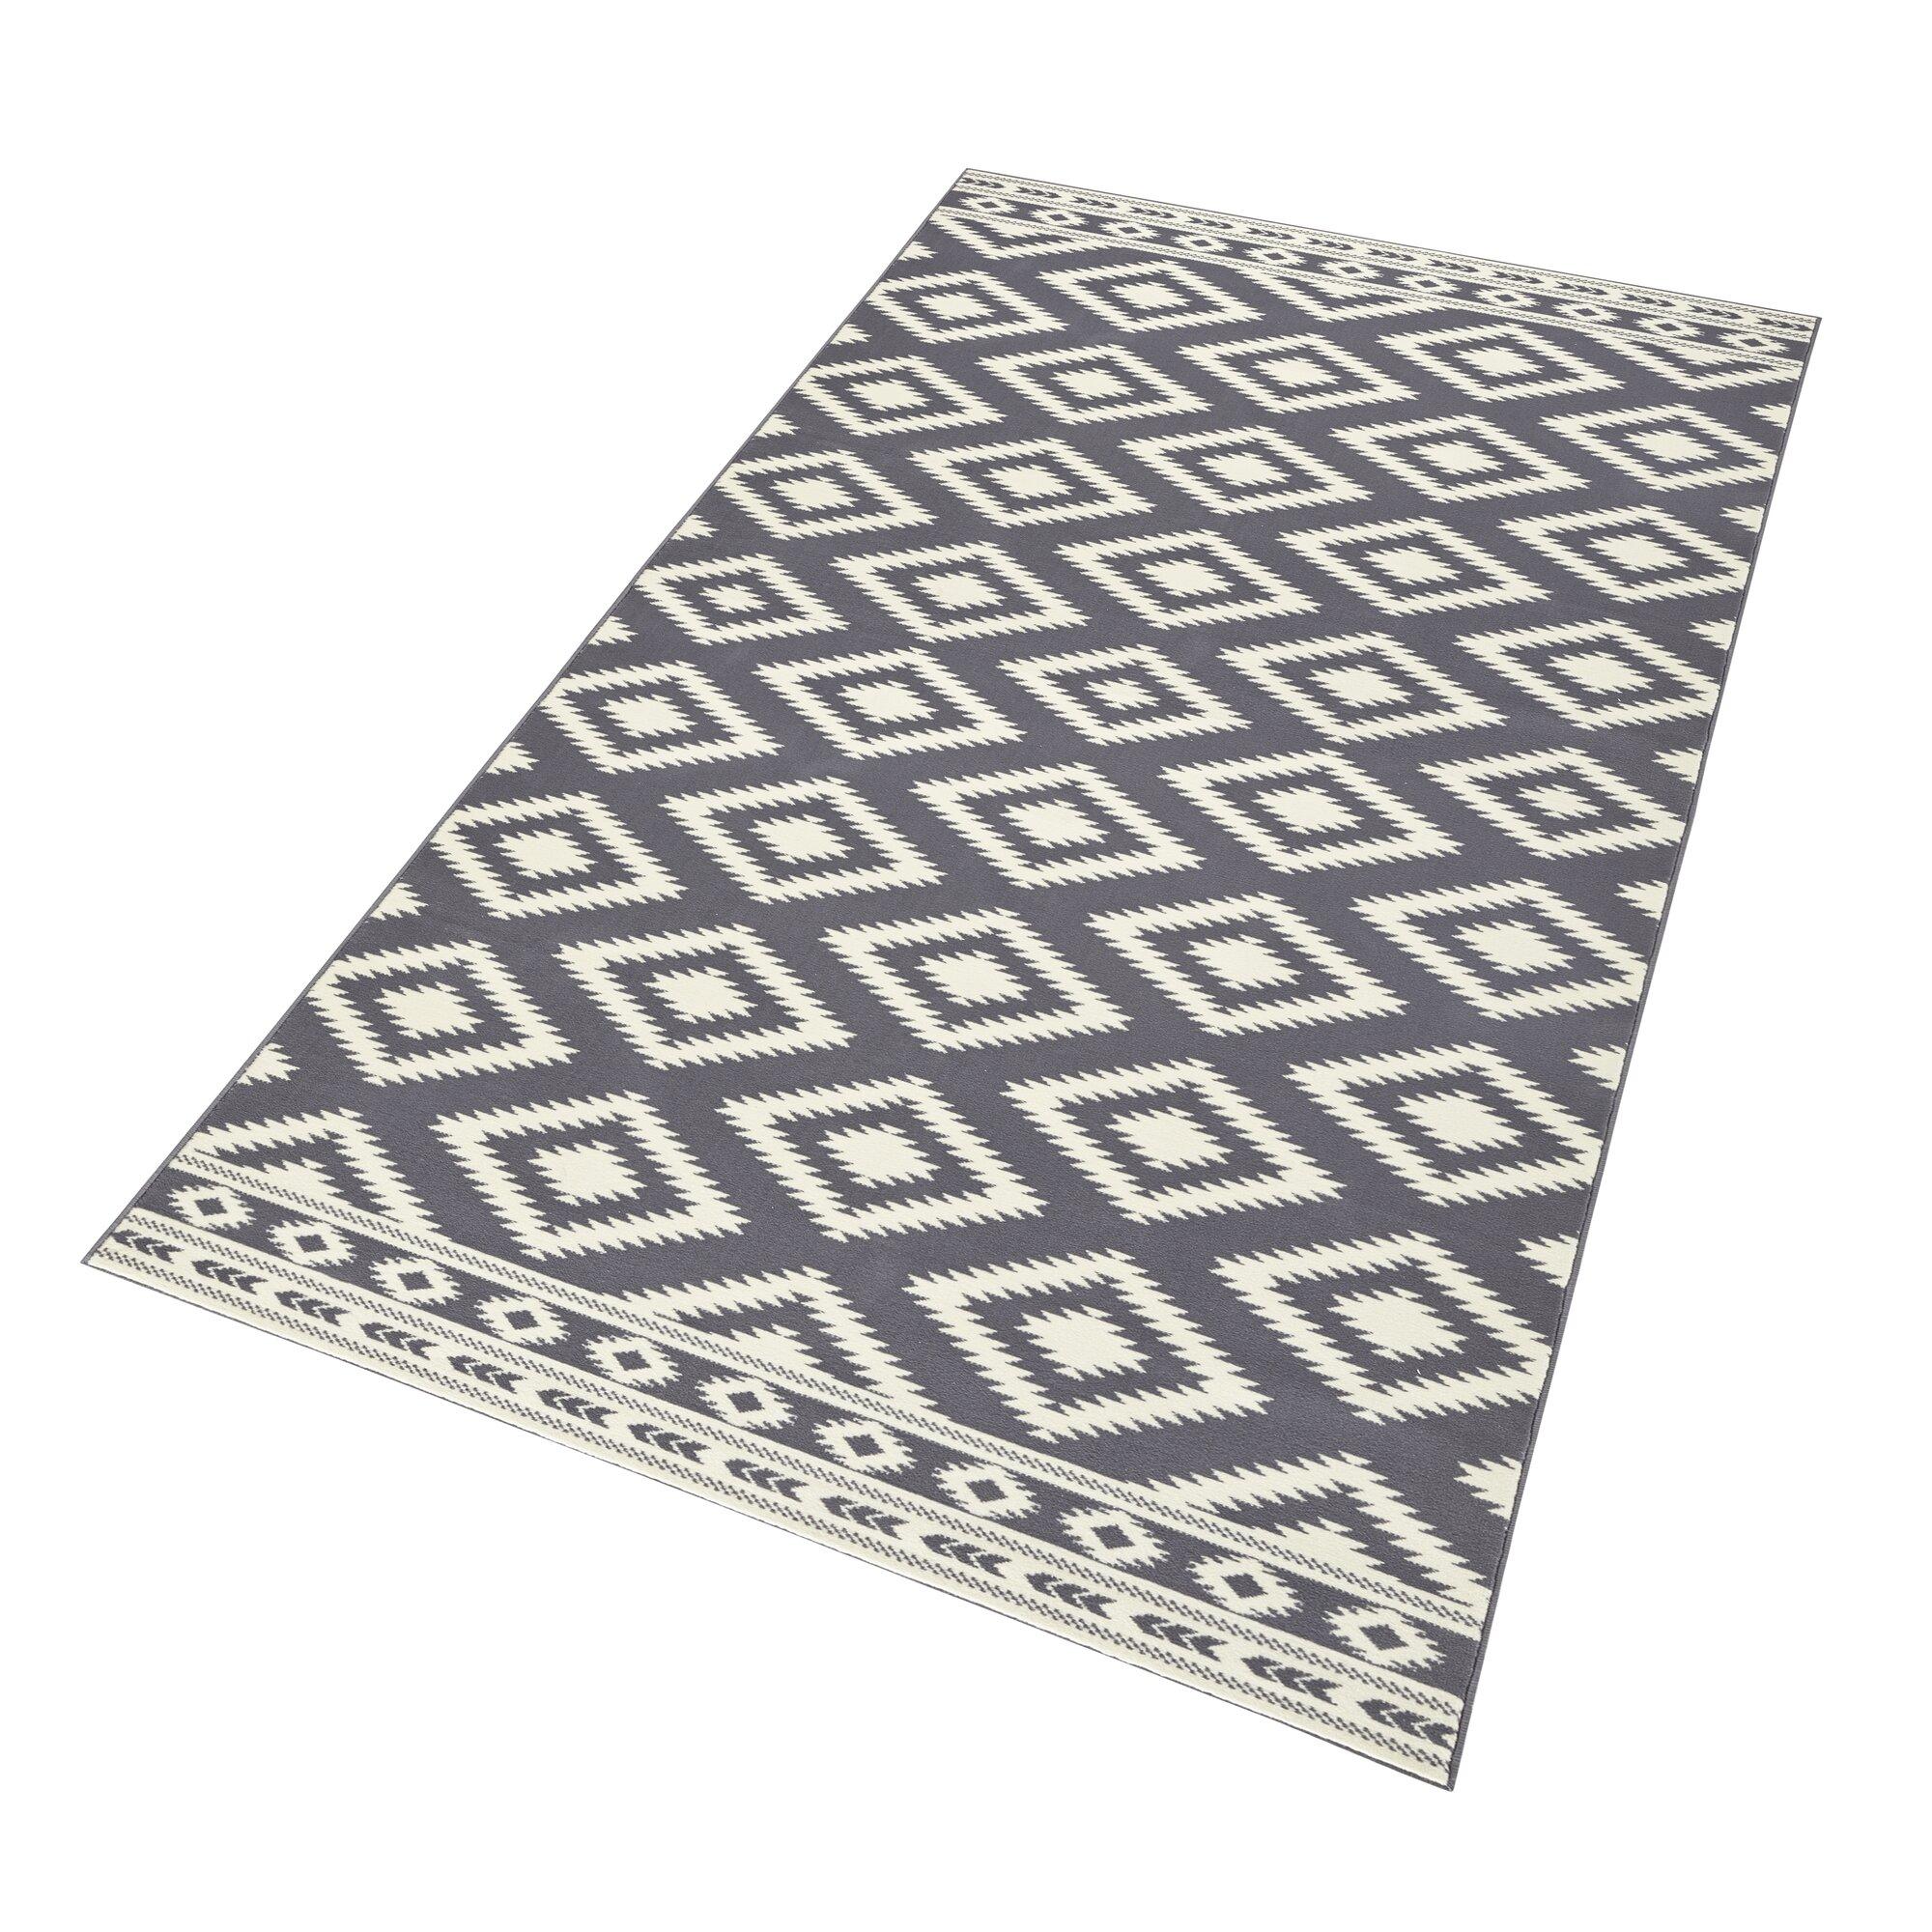 hanse home teppich ethno in grau creme bewertungen. Black Bedroom Furniture Sets. Home Design Ideas